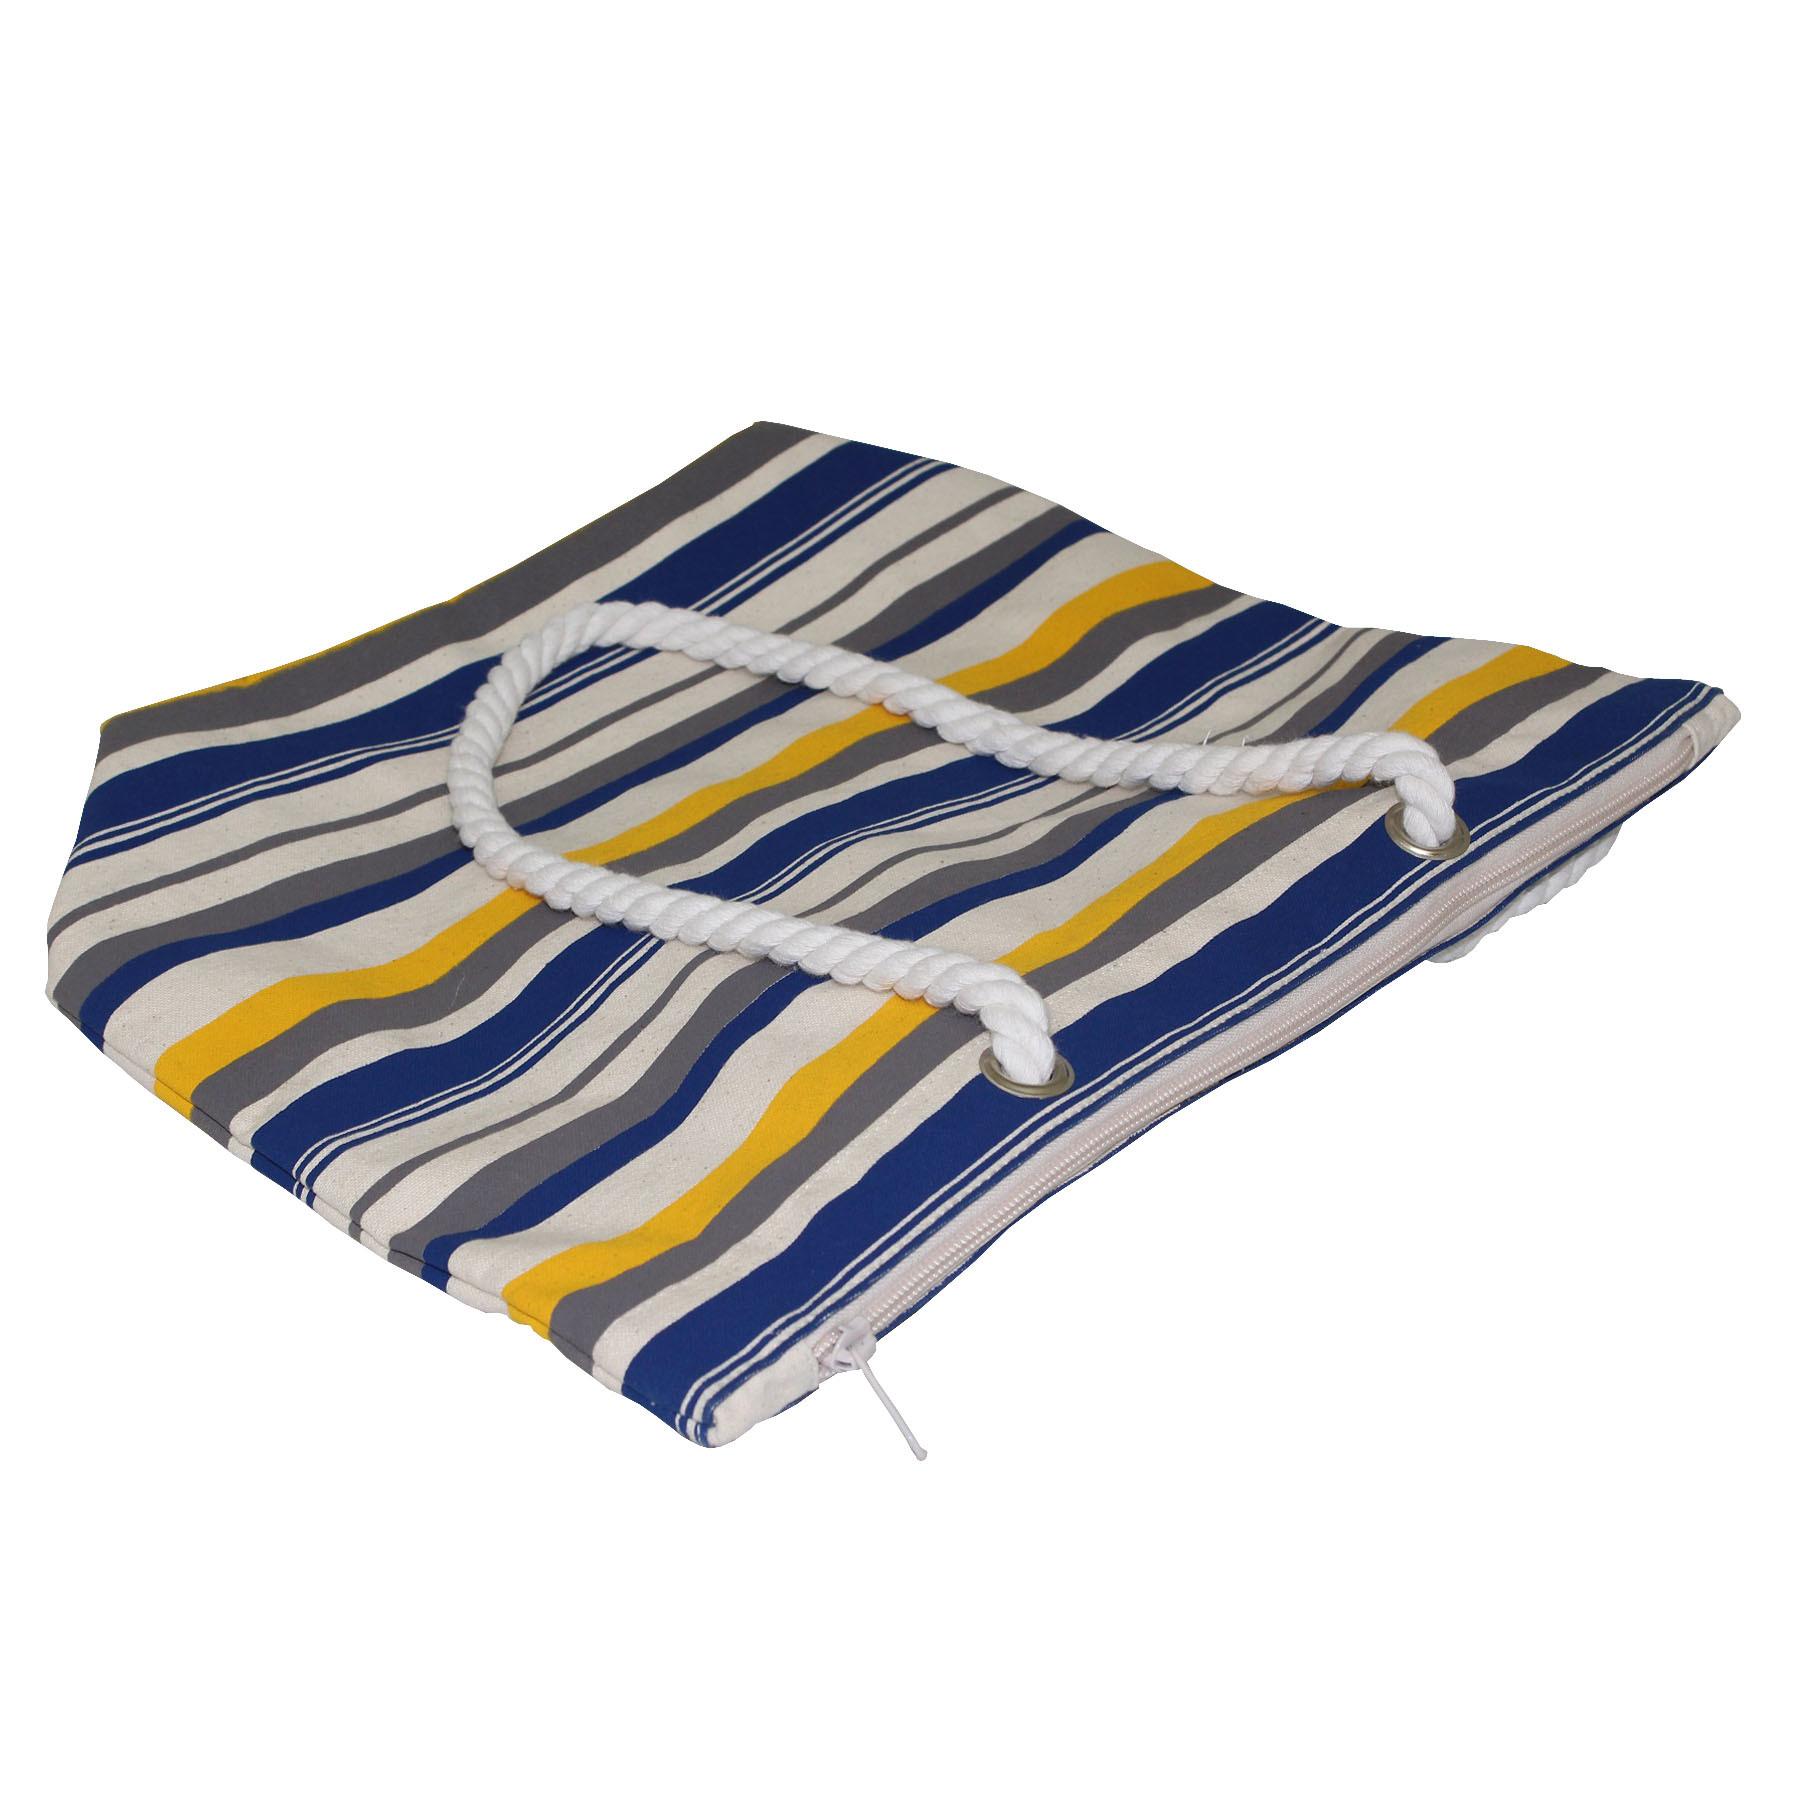 12 Oz Natural Canvas Tote Bag With Zip Closure